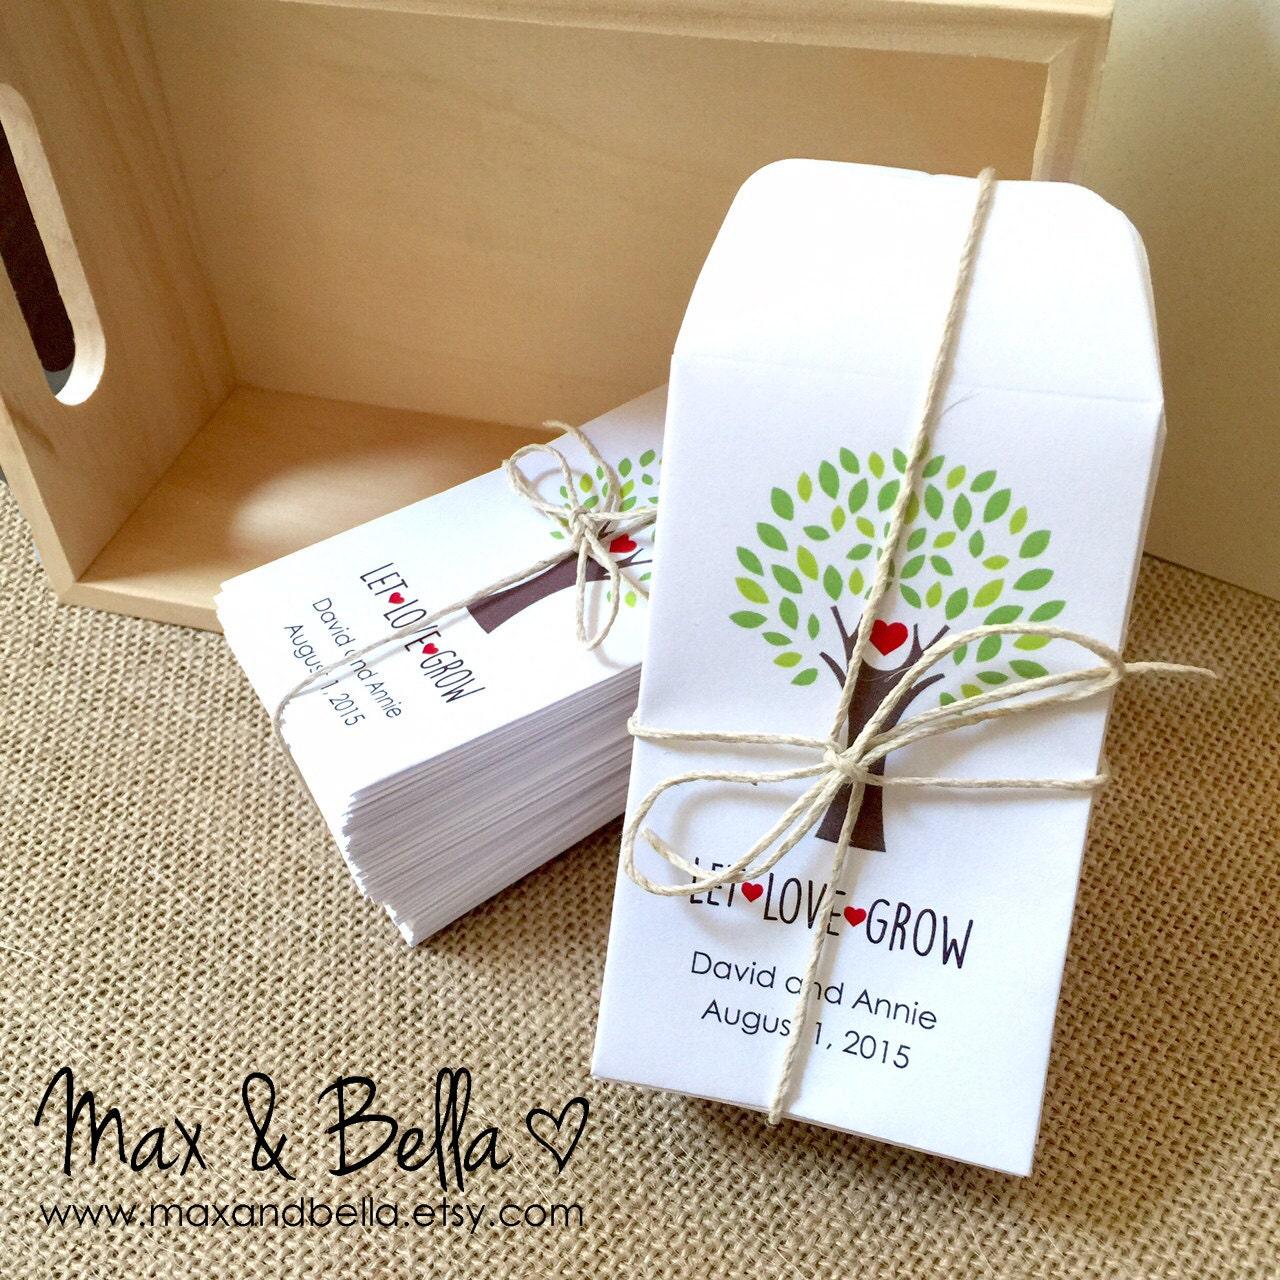 Custom Seed Packet Wedding Favors Let Love Grow Envelope Kraft Personalized Envelopes Momento